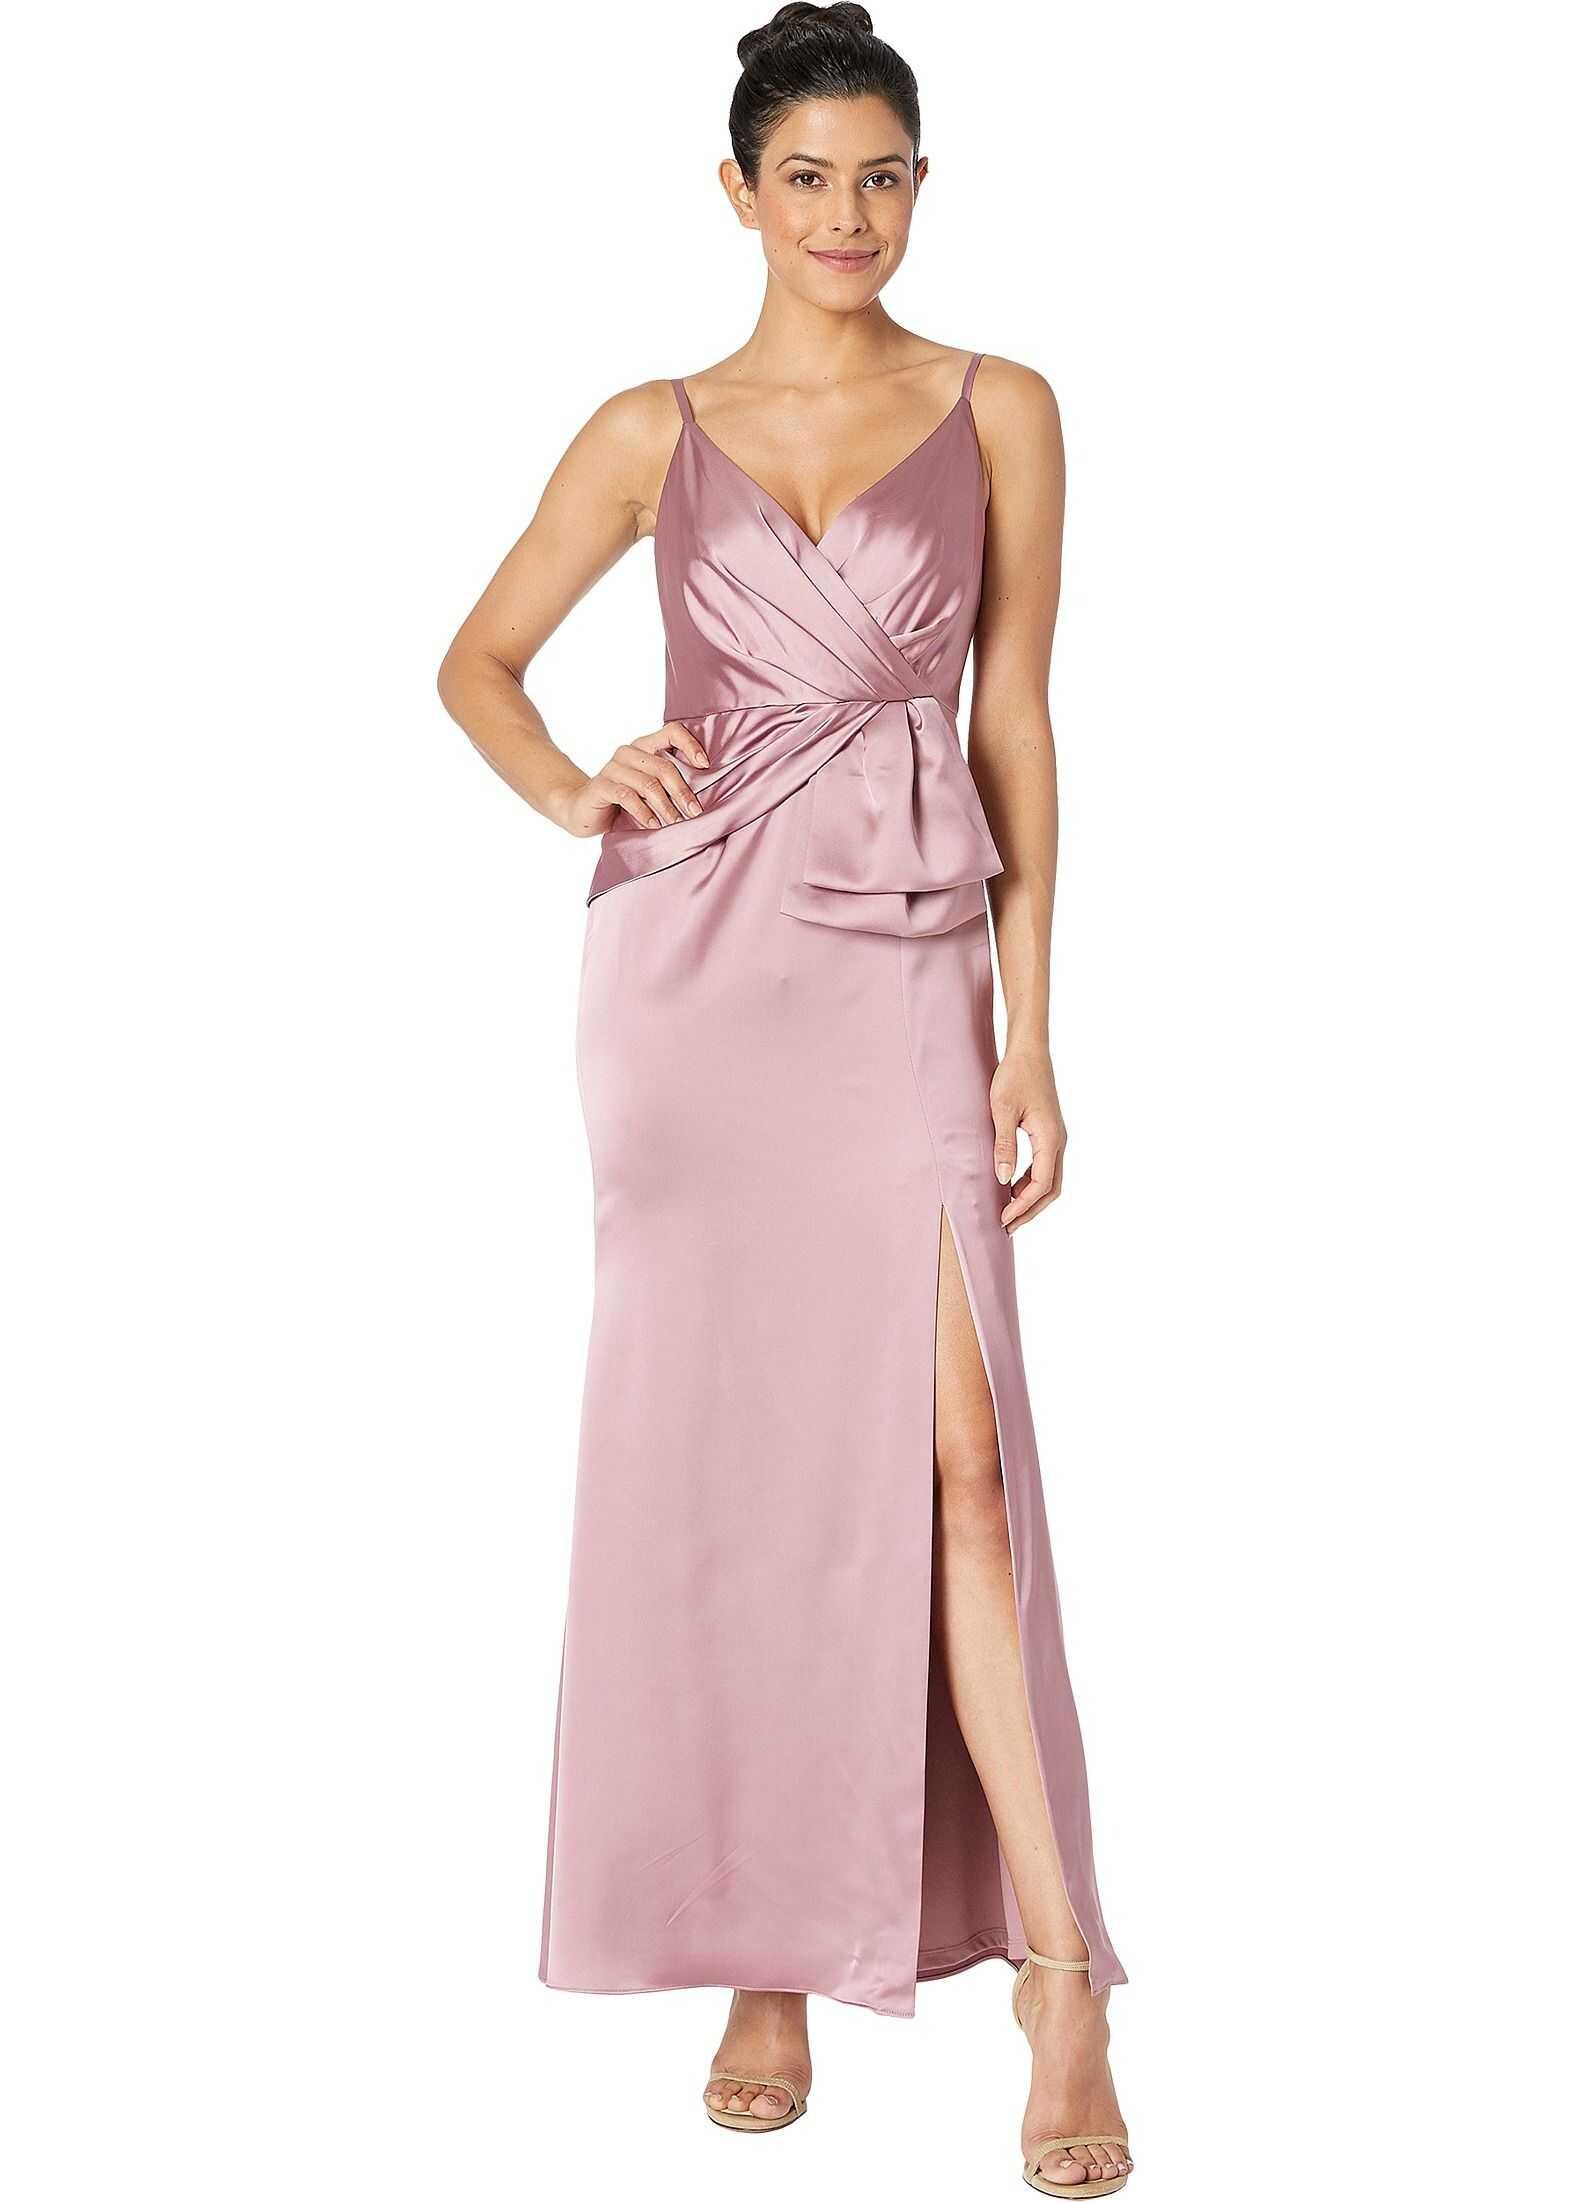 Adrianna Papell Petite Light Satin Dress Rose